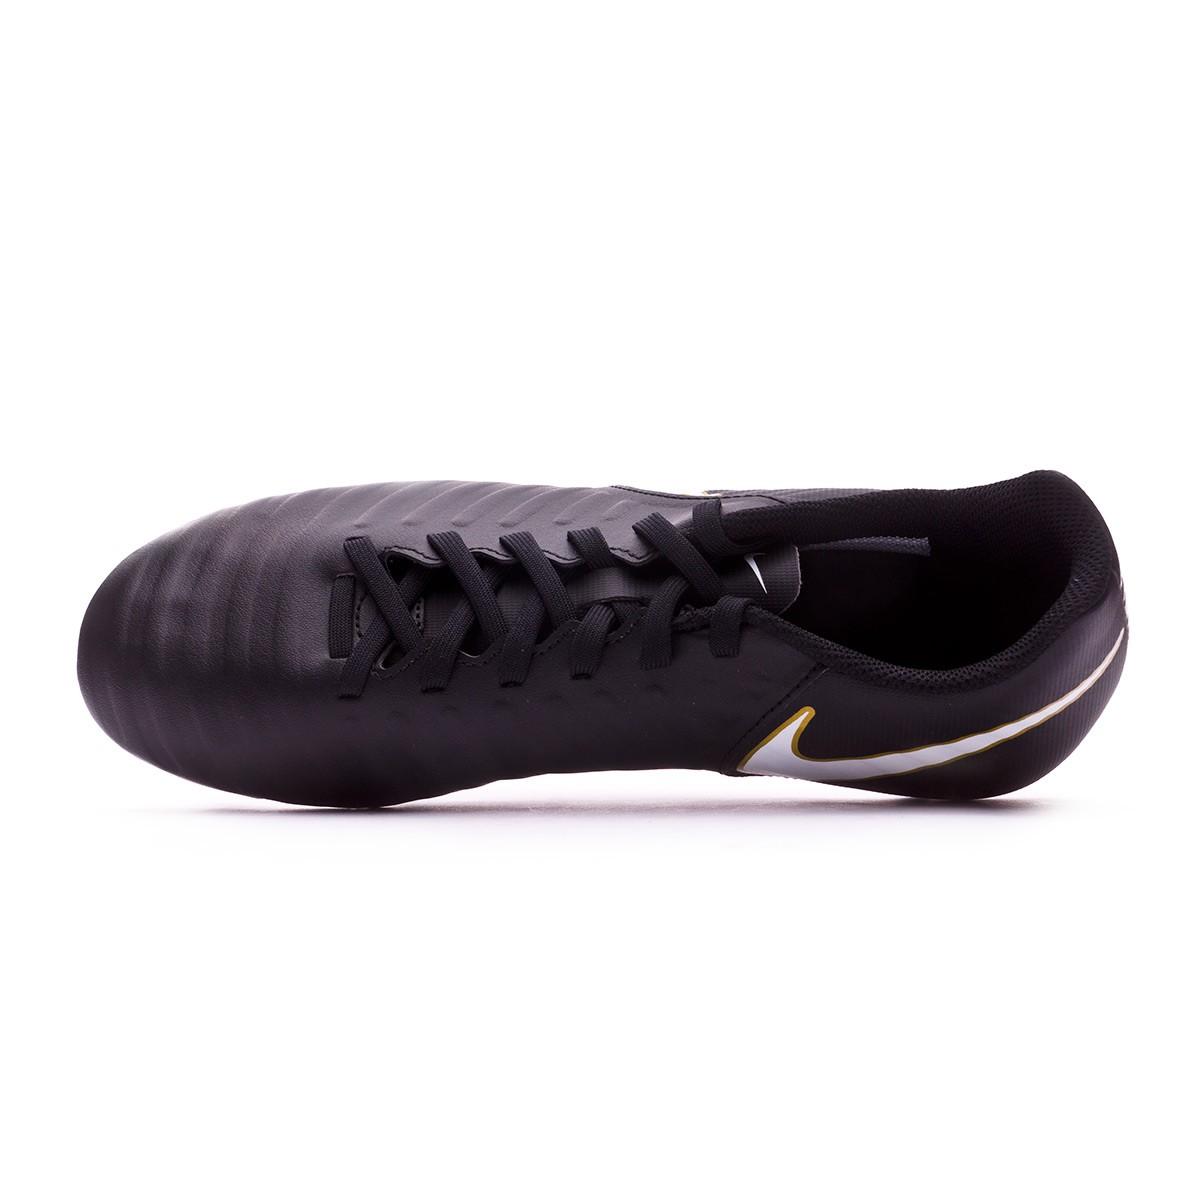 7834c88ecc Football Boots Nike Tiempo Rio IV SG Black-White - Tienda de fútbol Fútbol  Emotion